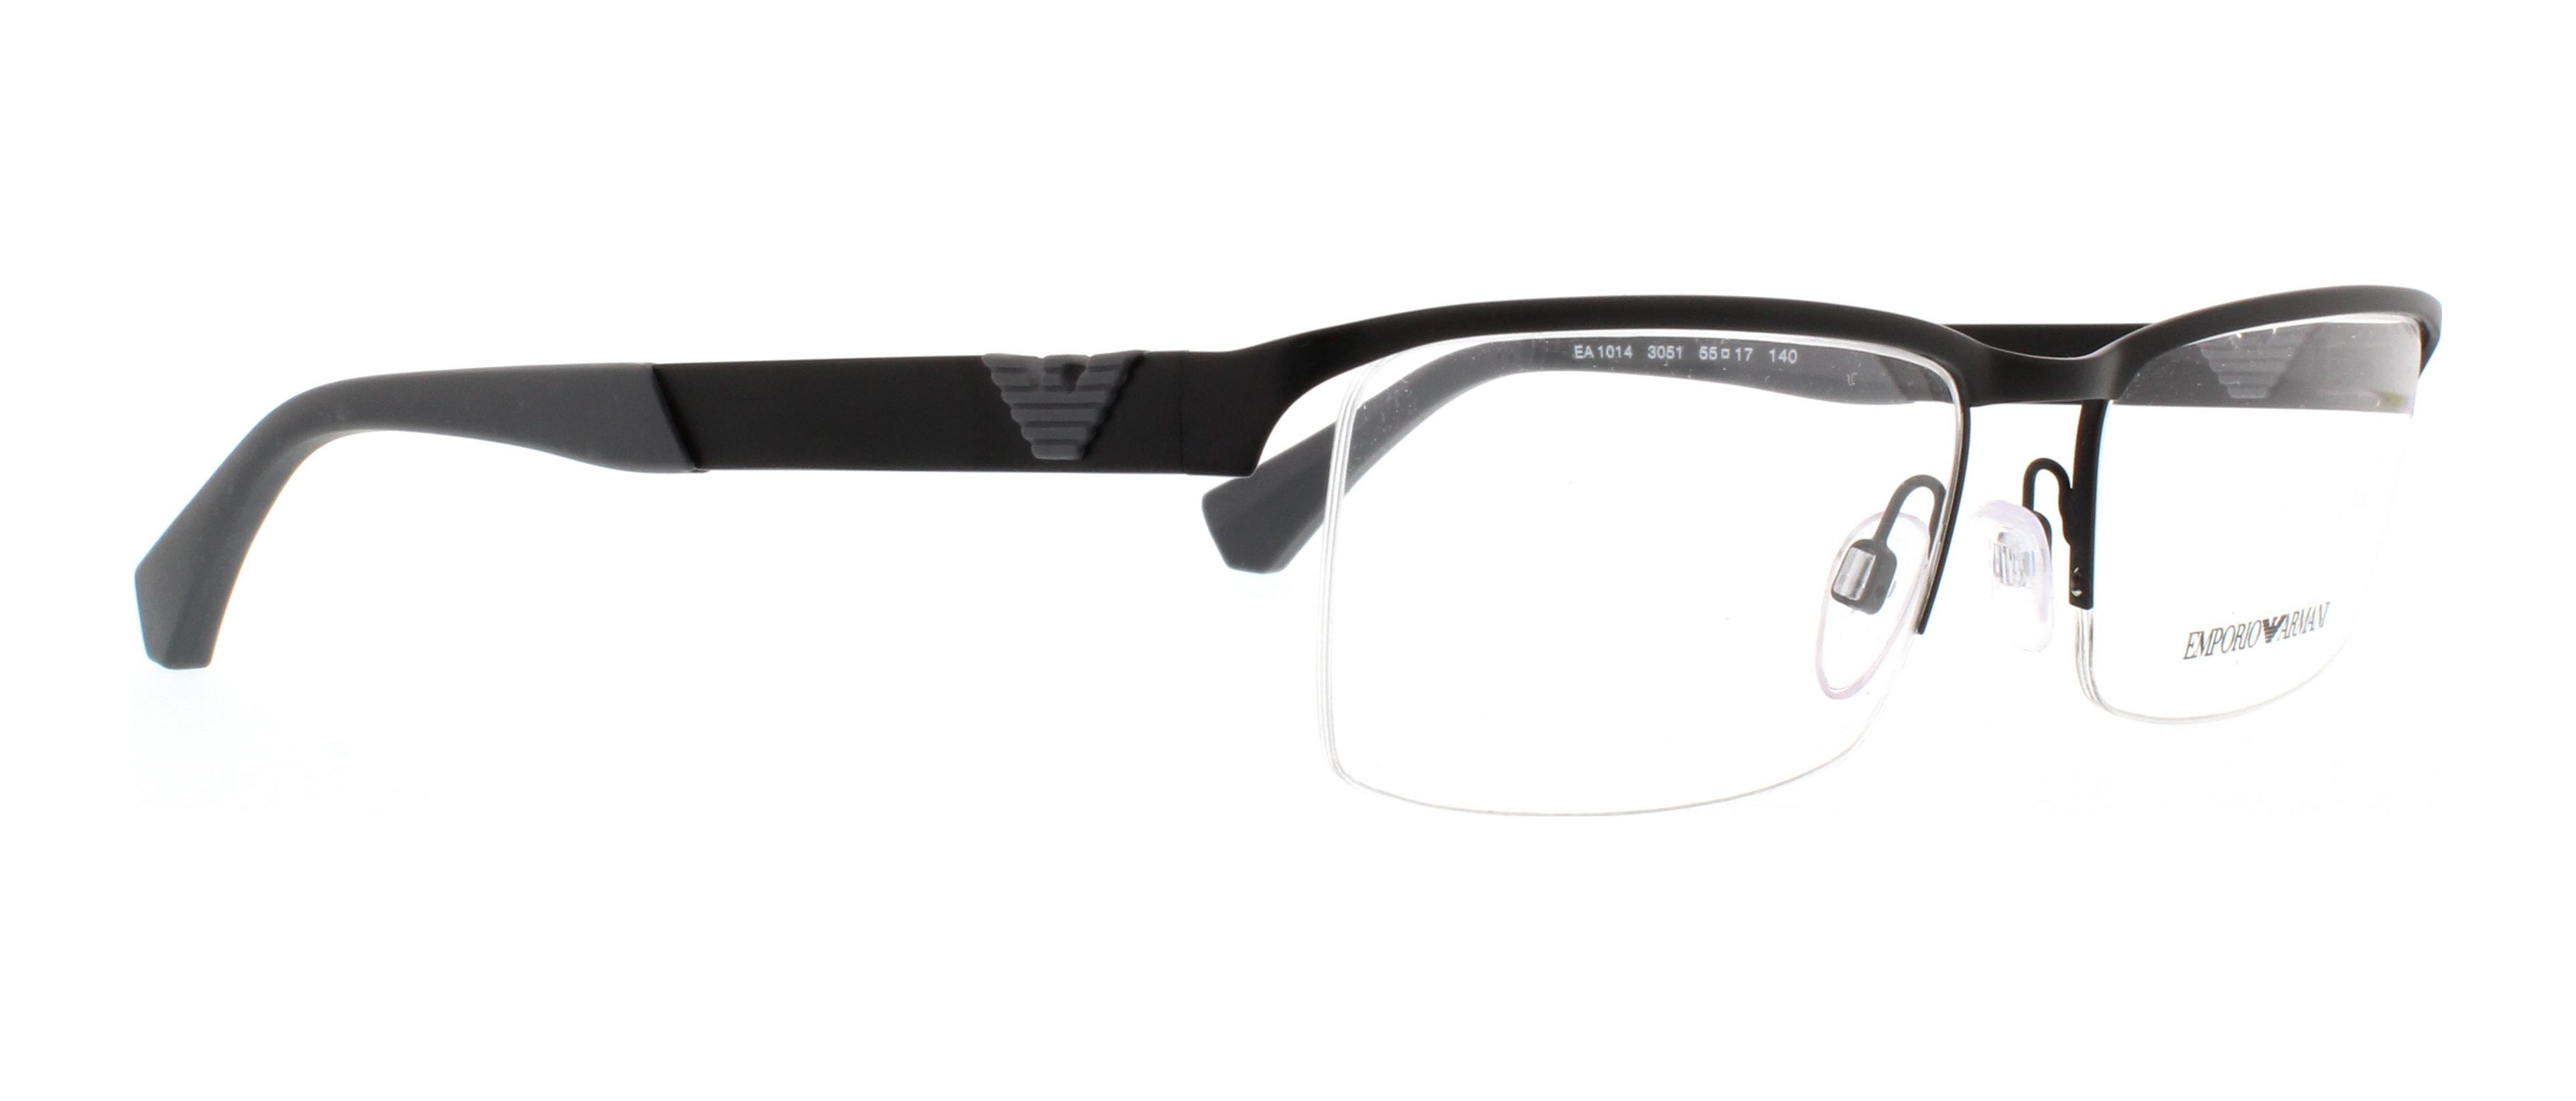 9fc81b3aa711 Designer Frames Outlet. Emporio Armani EA1006